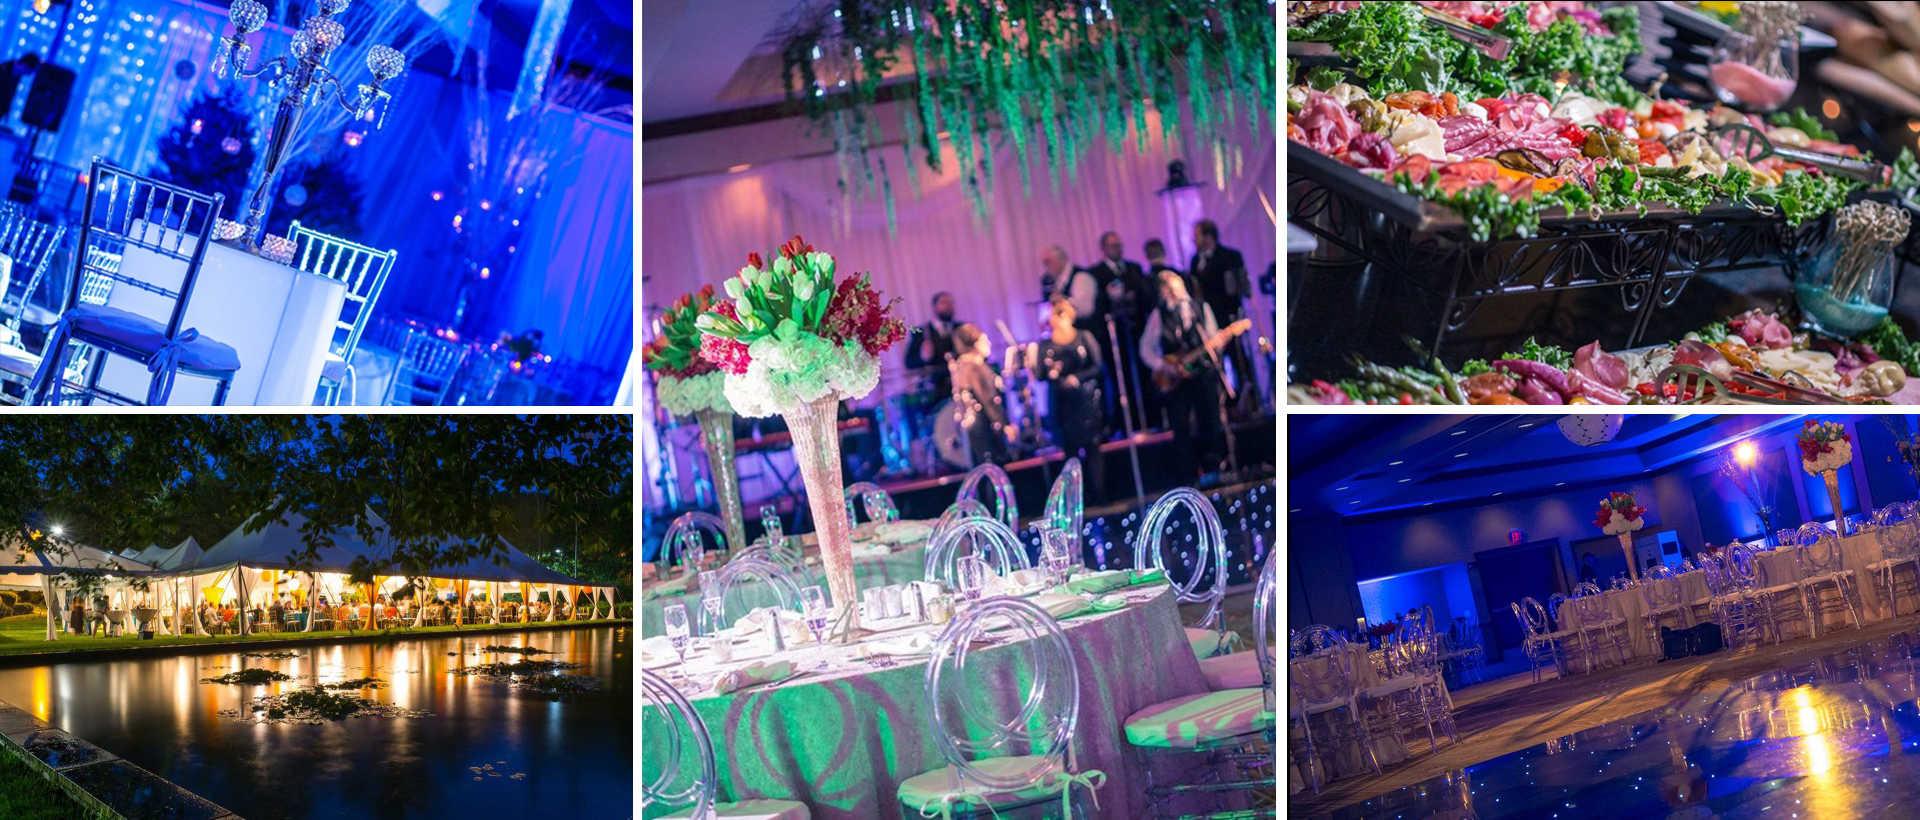 Photos of wedding venues in Lackawanna County, PA.